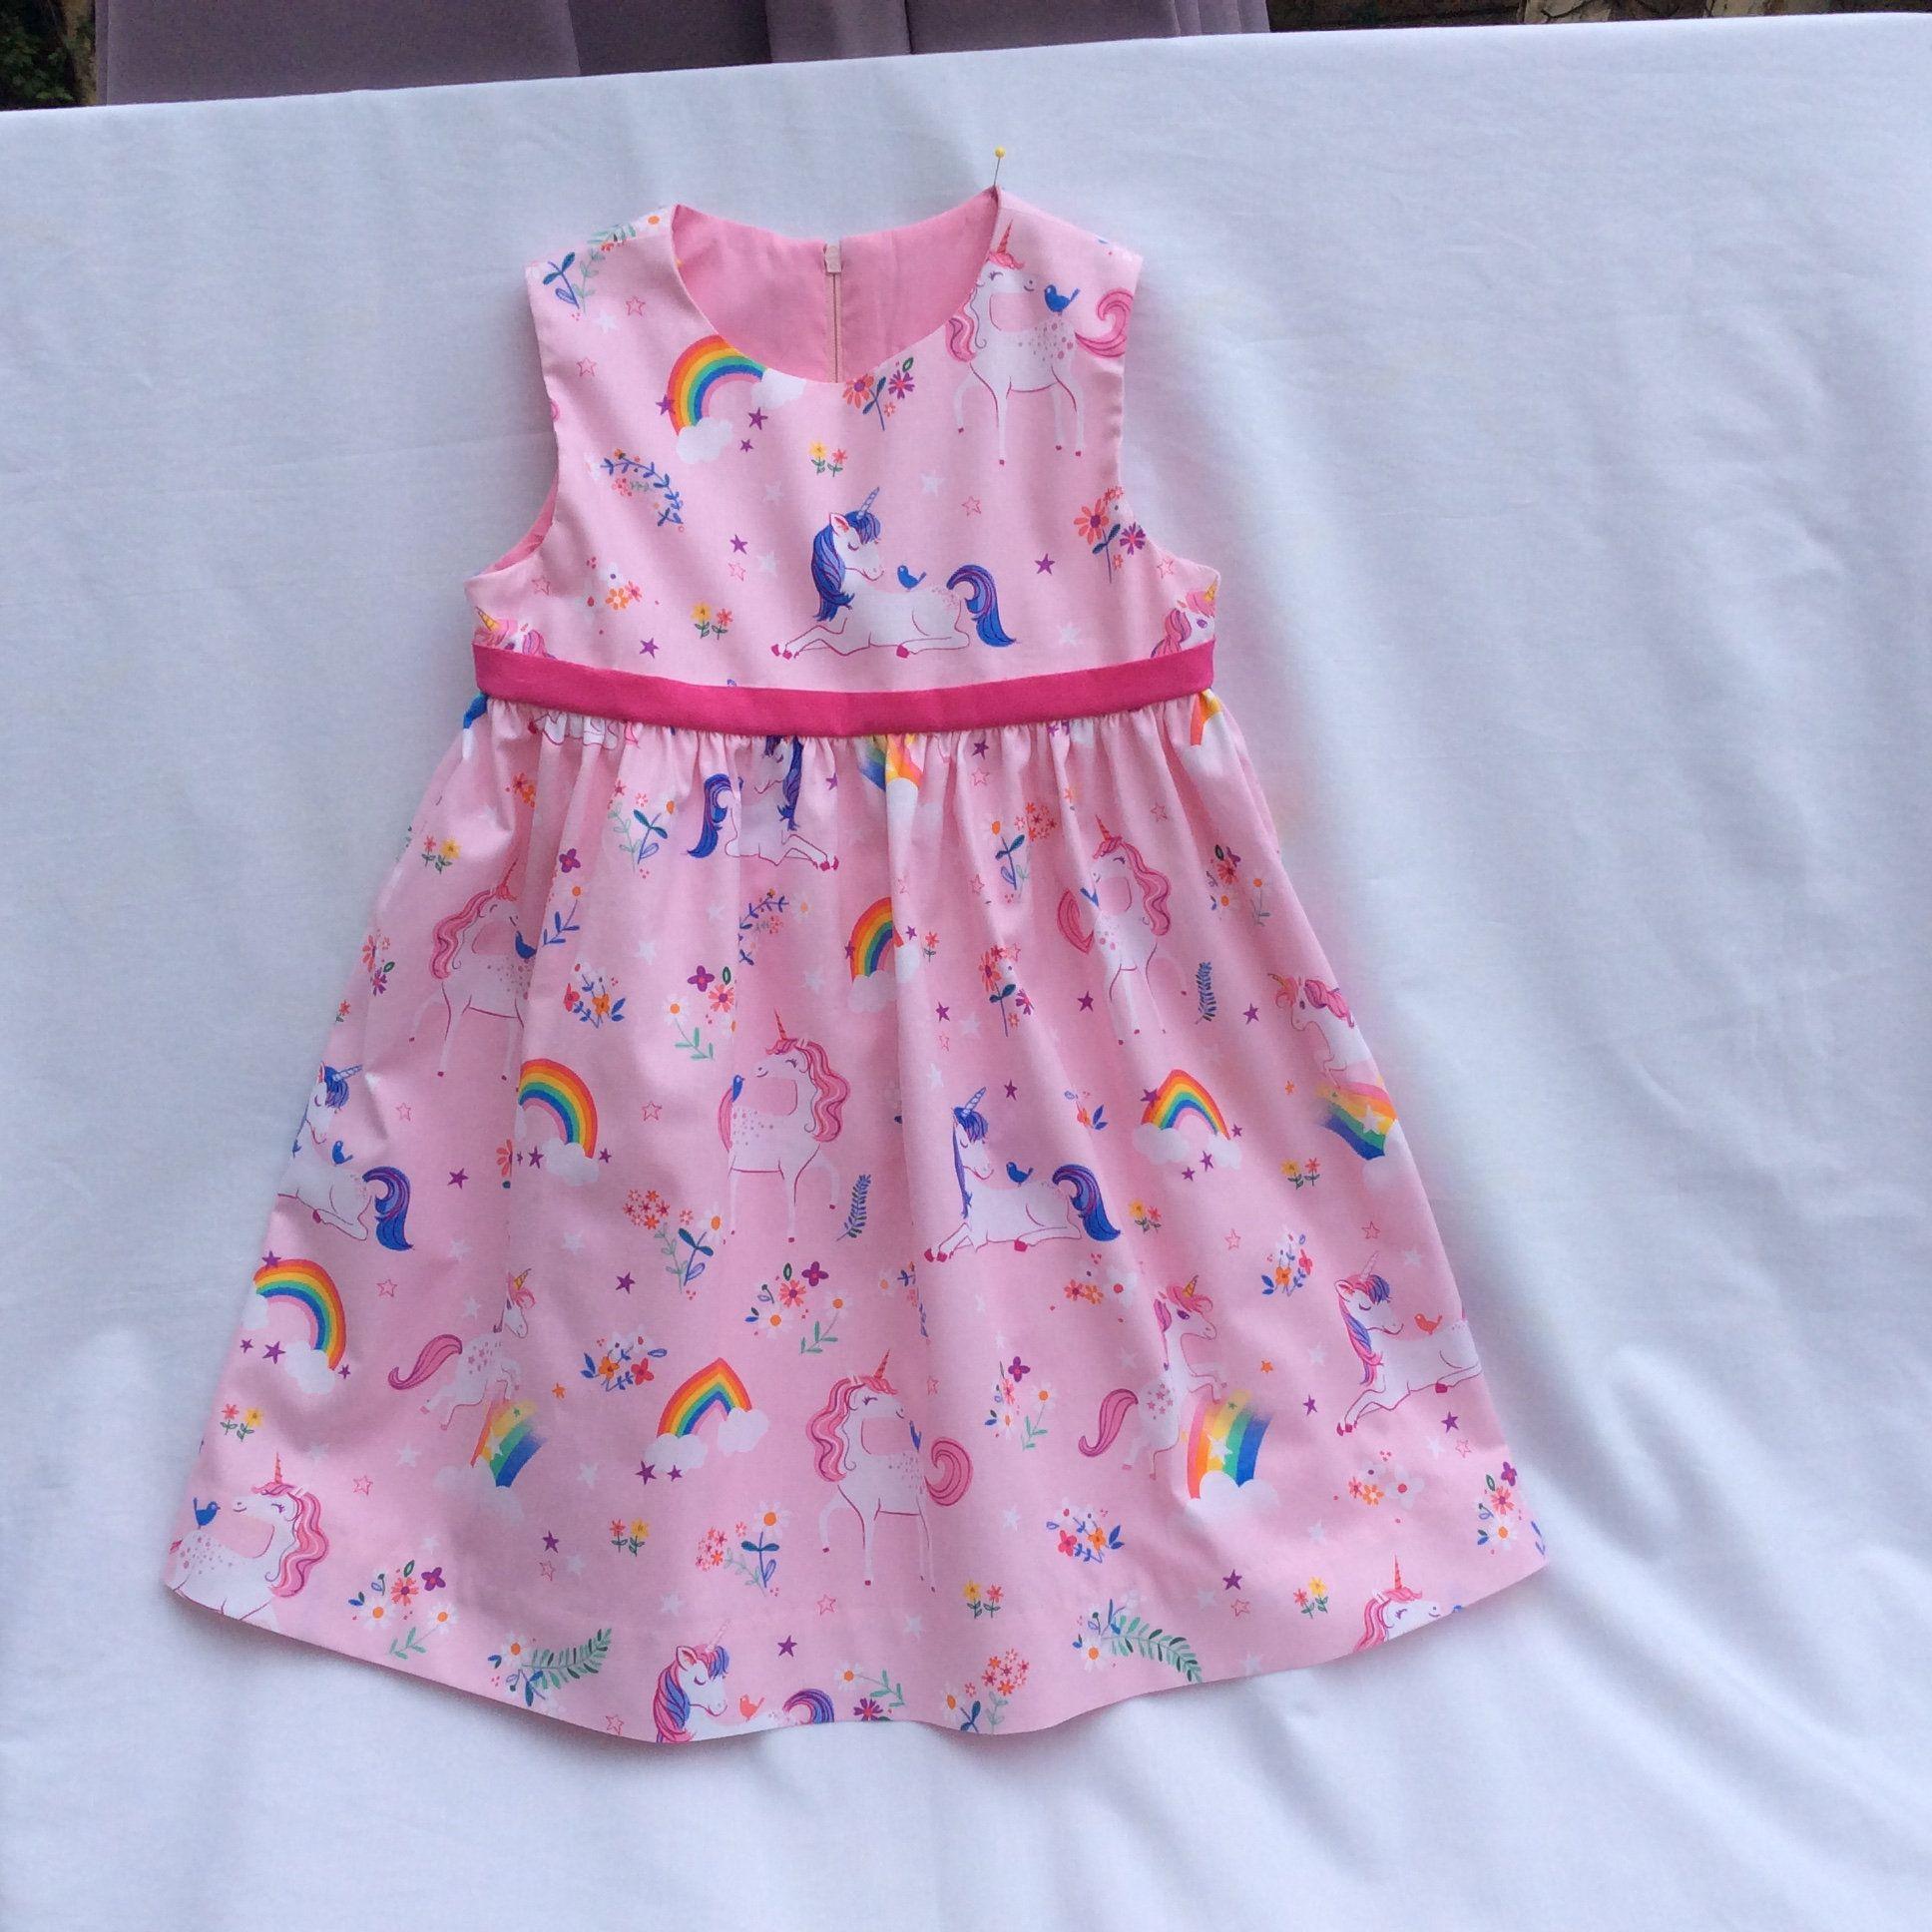 Girls Unicorns Rainbows Flowers Party Birthday Dress Pink Etsy Purple Girls Dress Girls Pink Dress Cute Little Girls Outfits [ 1936 x 1936 Pixel ]